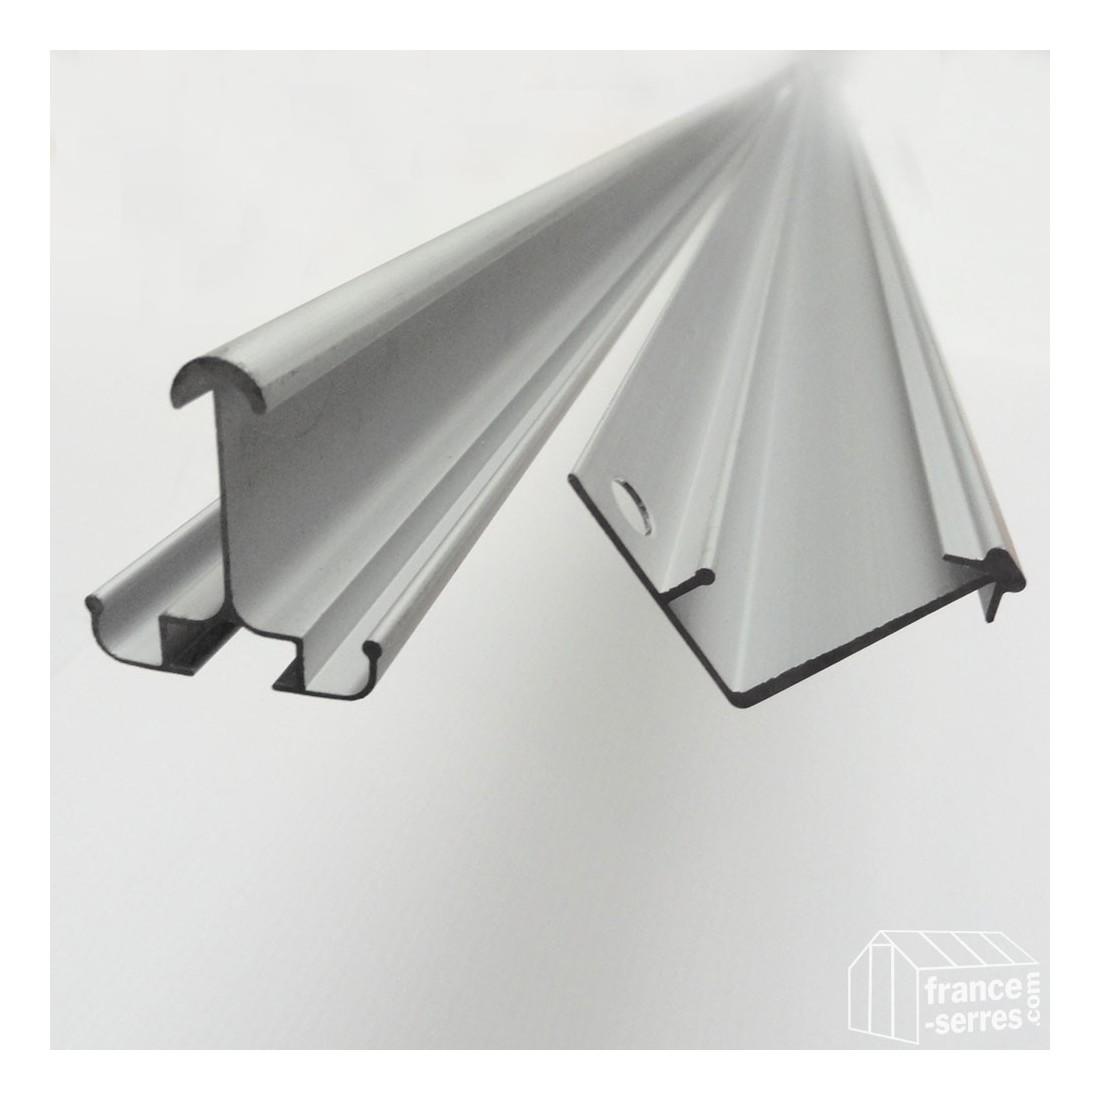 Profiles de la structure en aluminium de la serre de for Serre de jardin richel